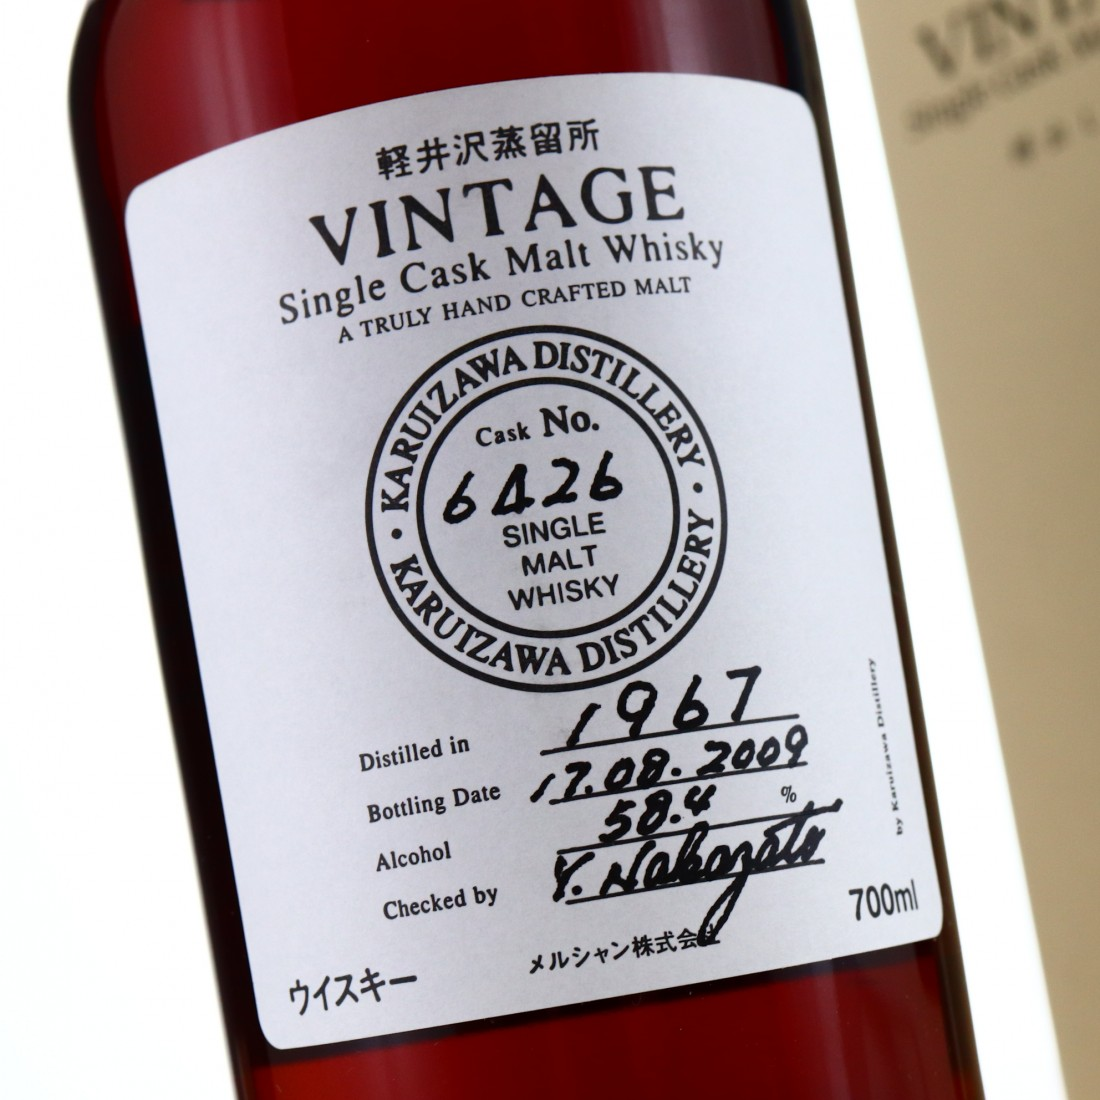 Karuizawa 1967 Single Cask #6426 / TWE 10th Anniversary